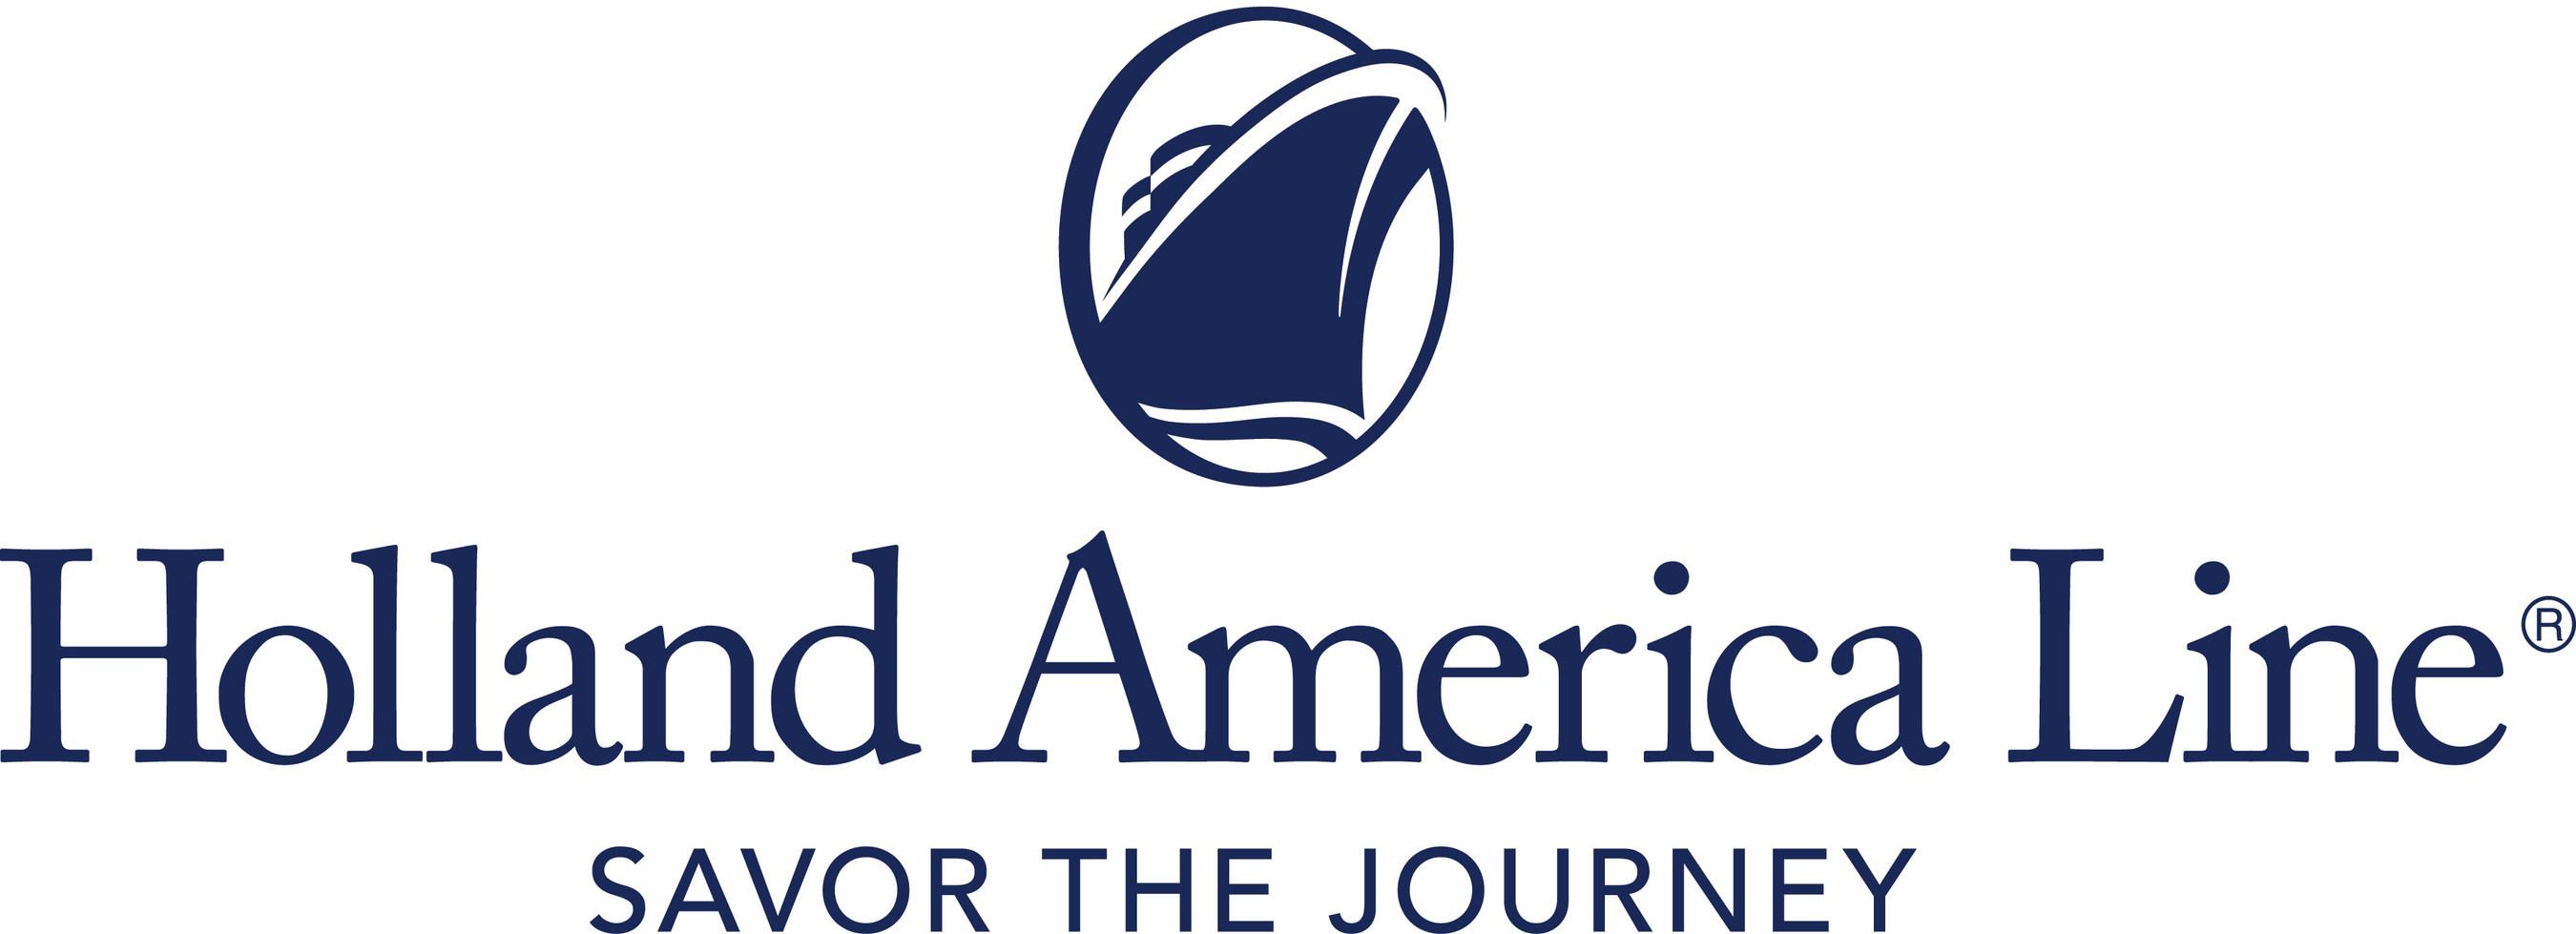 Holland America Line Standard Photo/Logo